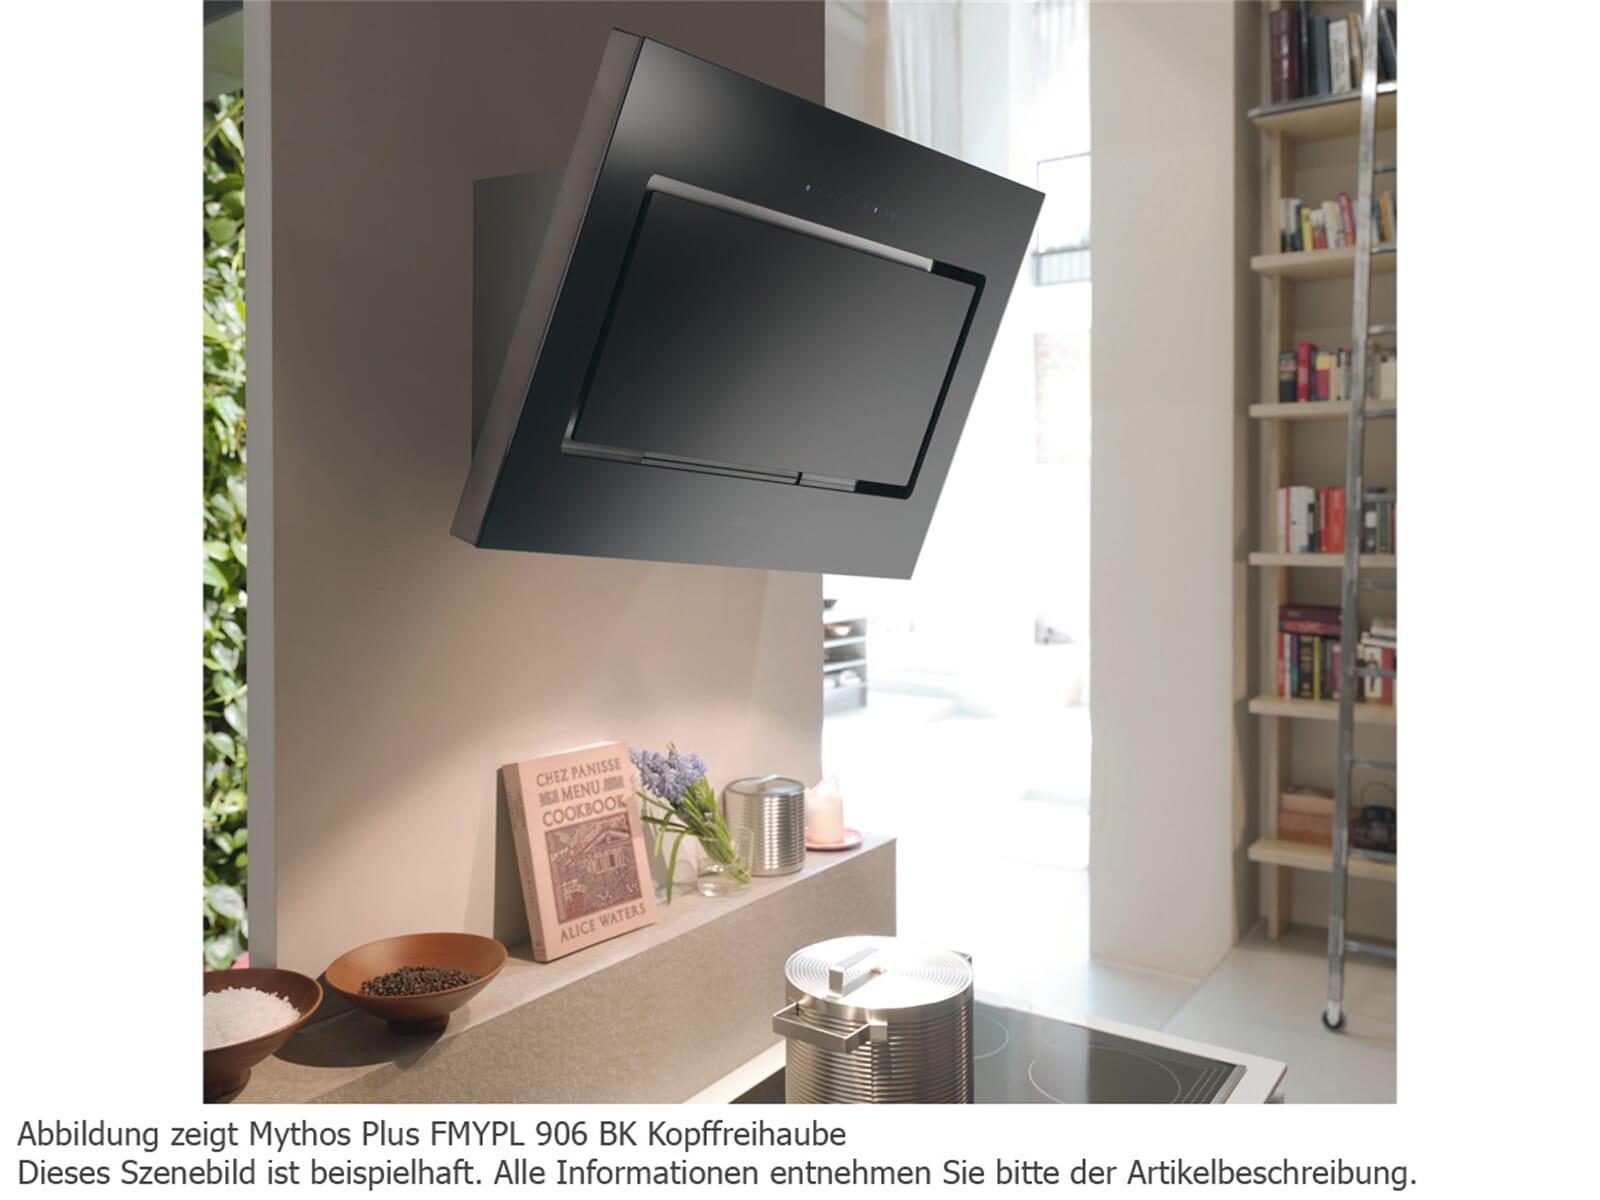 franke mythos plus fmypl 906 wh kopffrei esse wandhaube dunstabzugshaube wei ebay. Black Bedroom Furniture Sets. Home Design Ideas